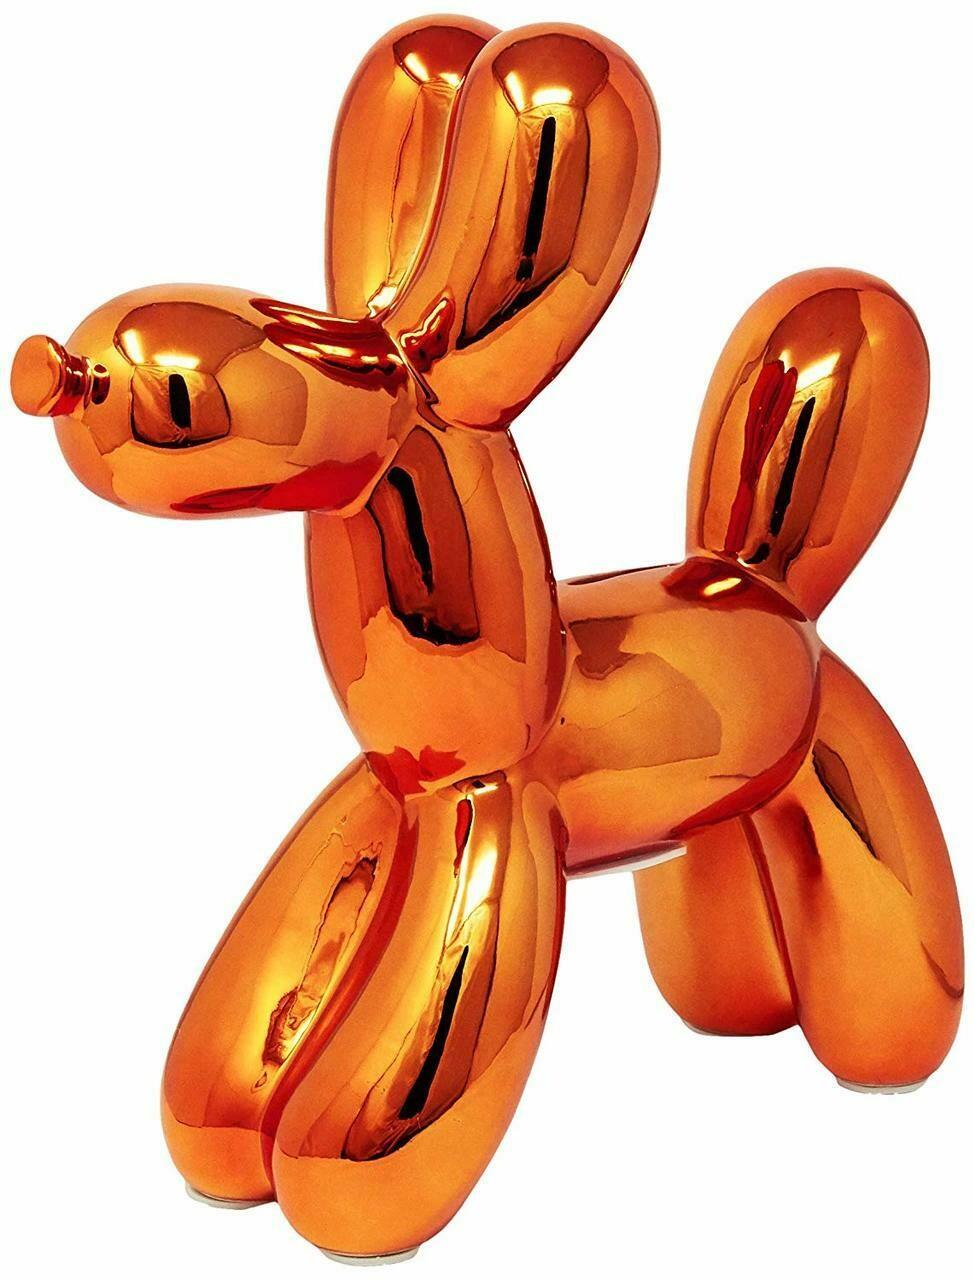 "Copper Balloon Dog Bank - 12"" tall"